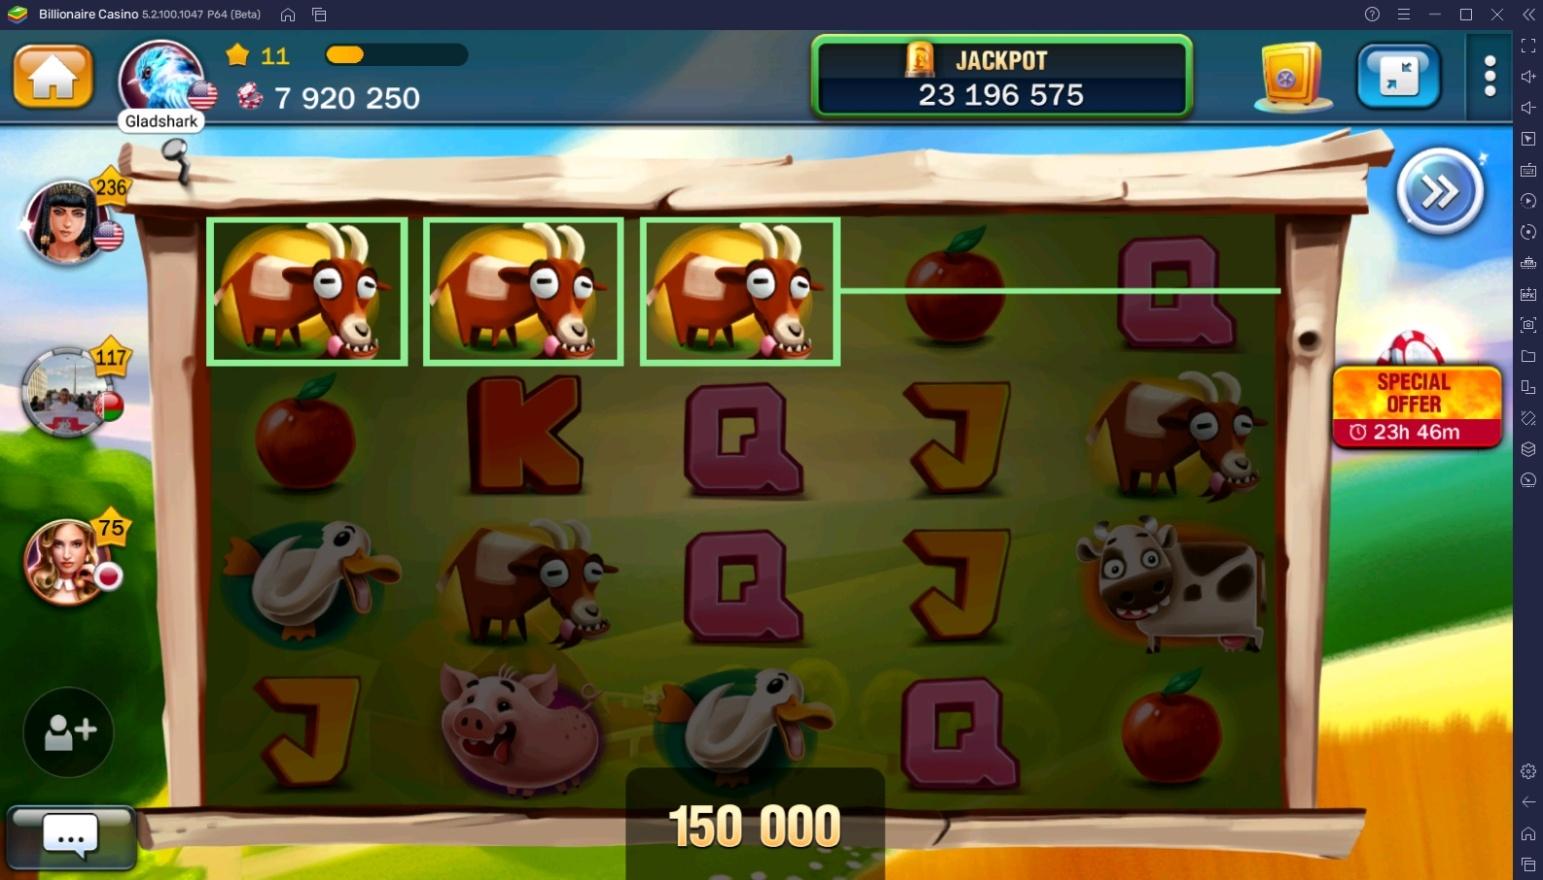 BlueStacks' Beginners Guide to Playing Billionaire Casino Slots 777